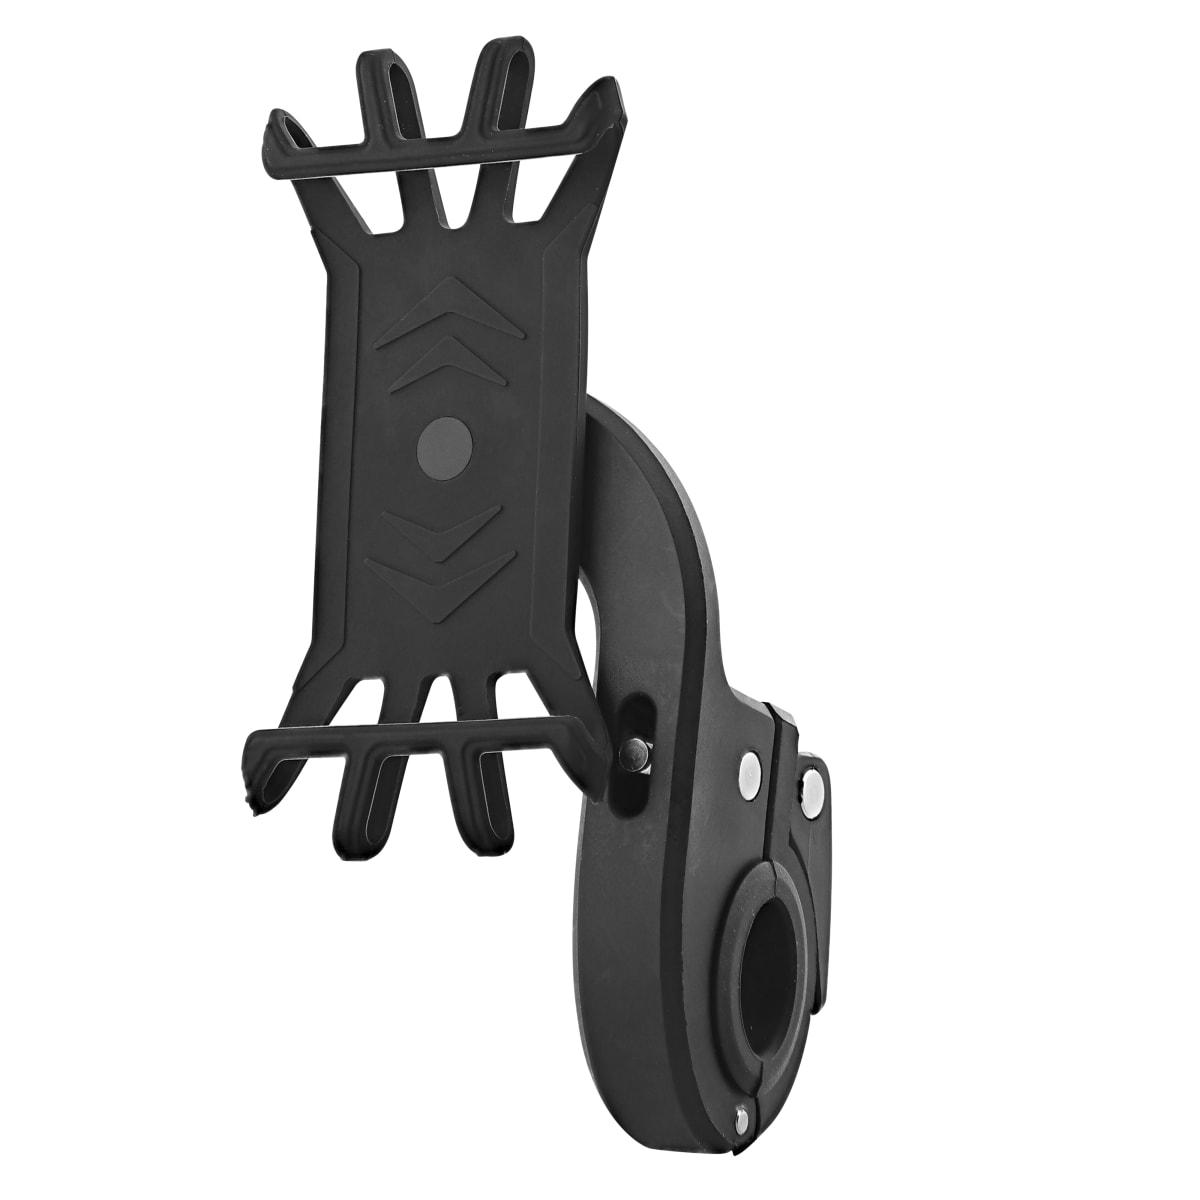 Rotary smartphone holder for bike/e-scooter